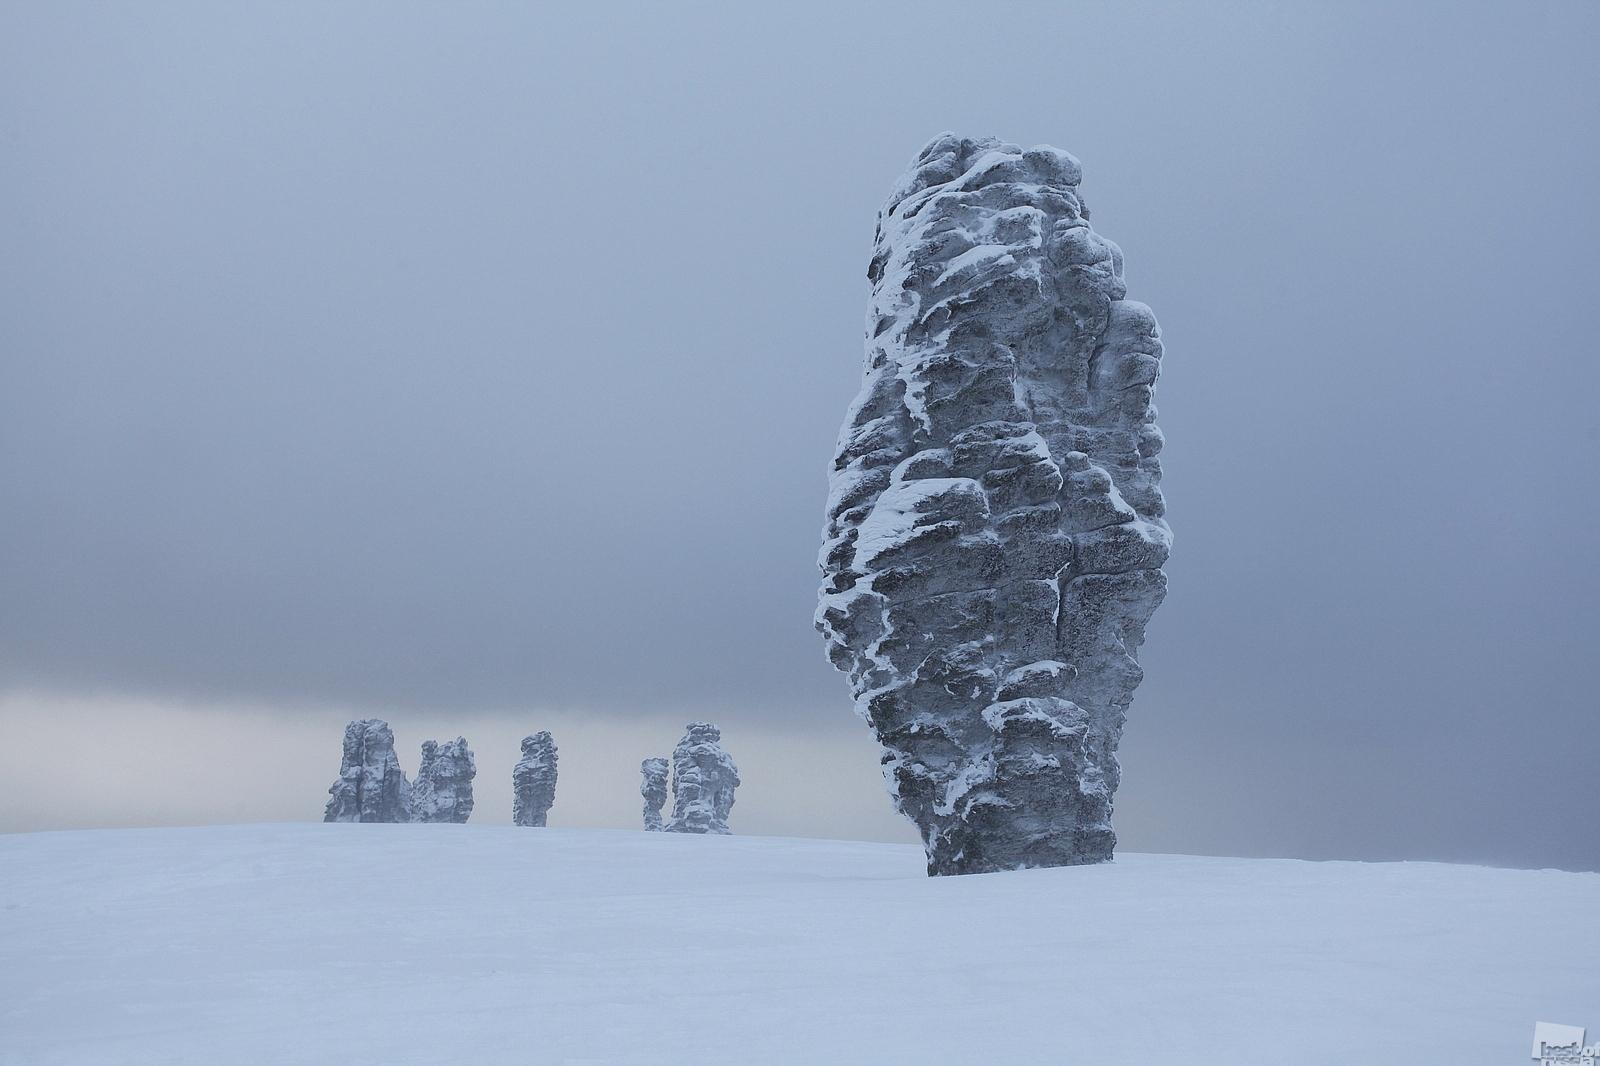 Sub-Arctic Urals, Manpupupner Plateau, Komi Republic